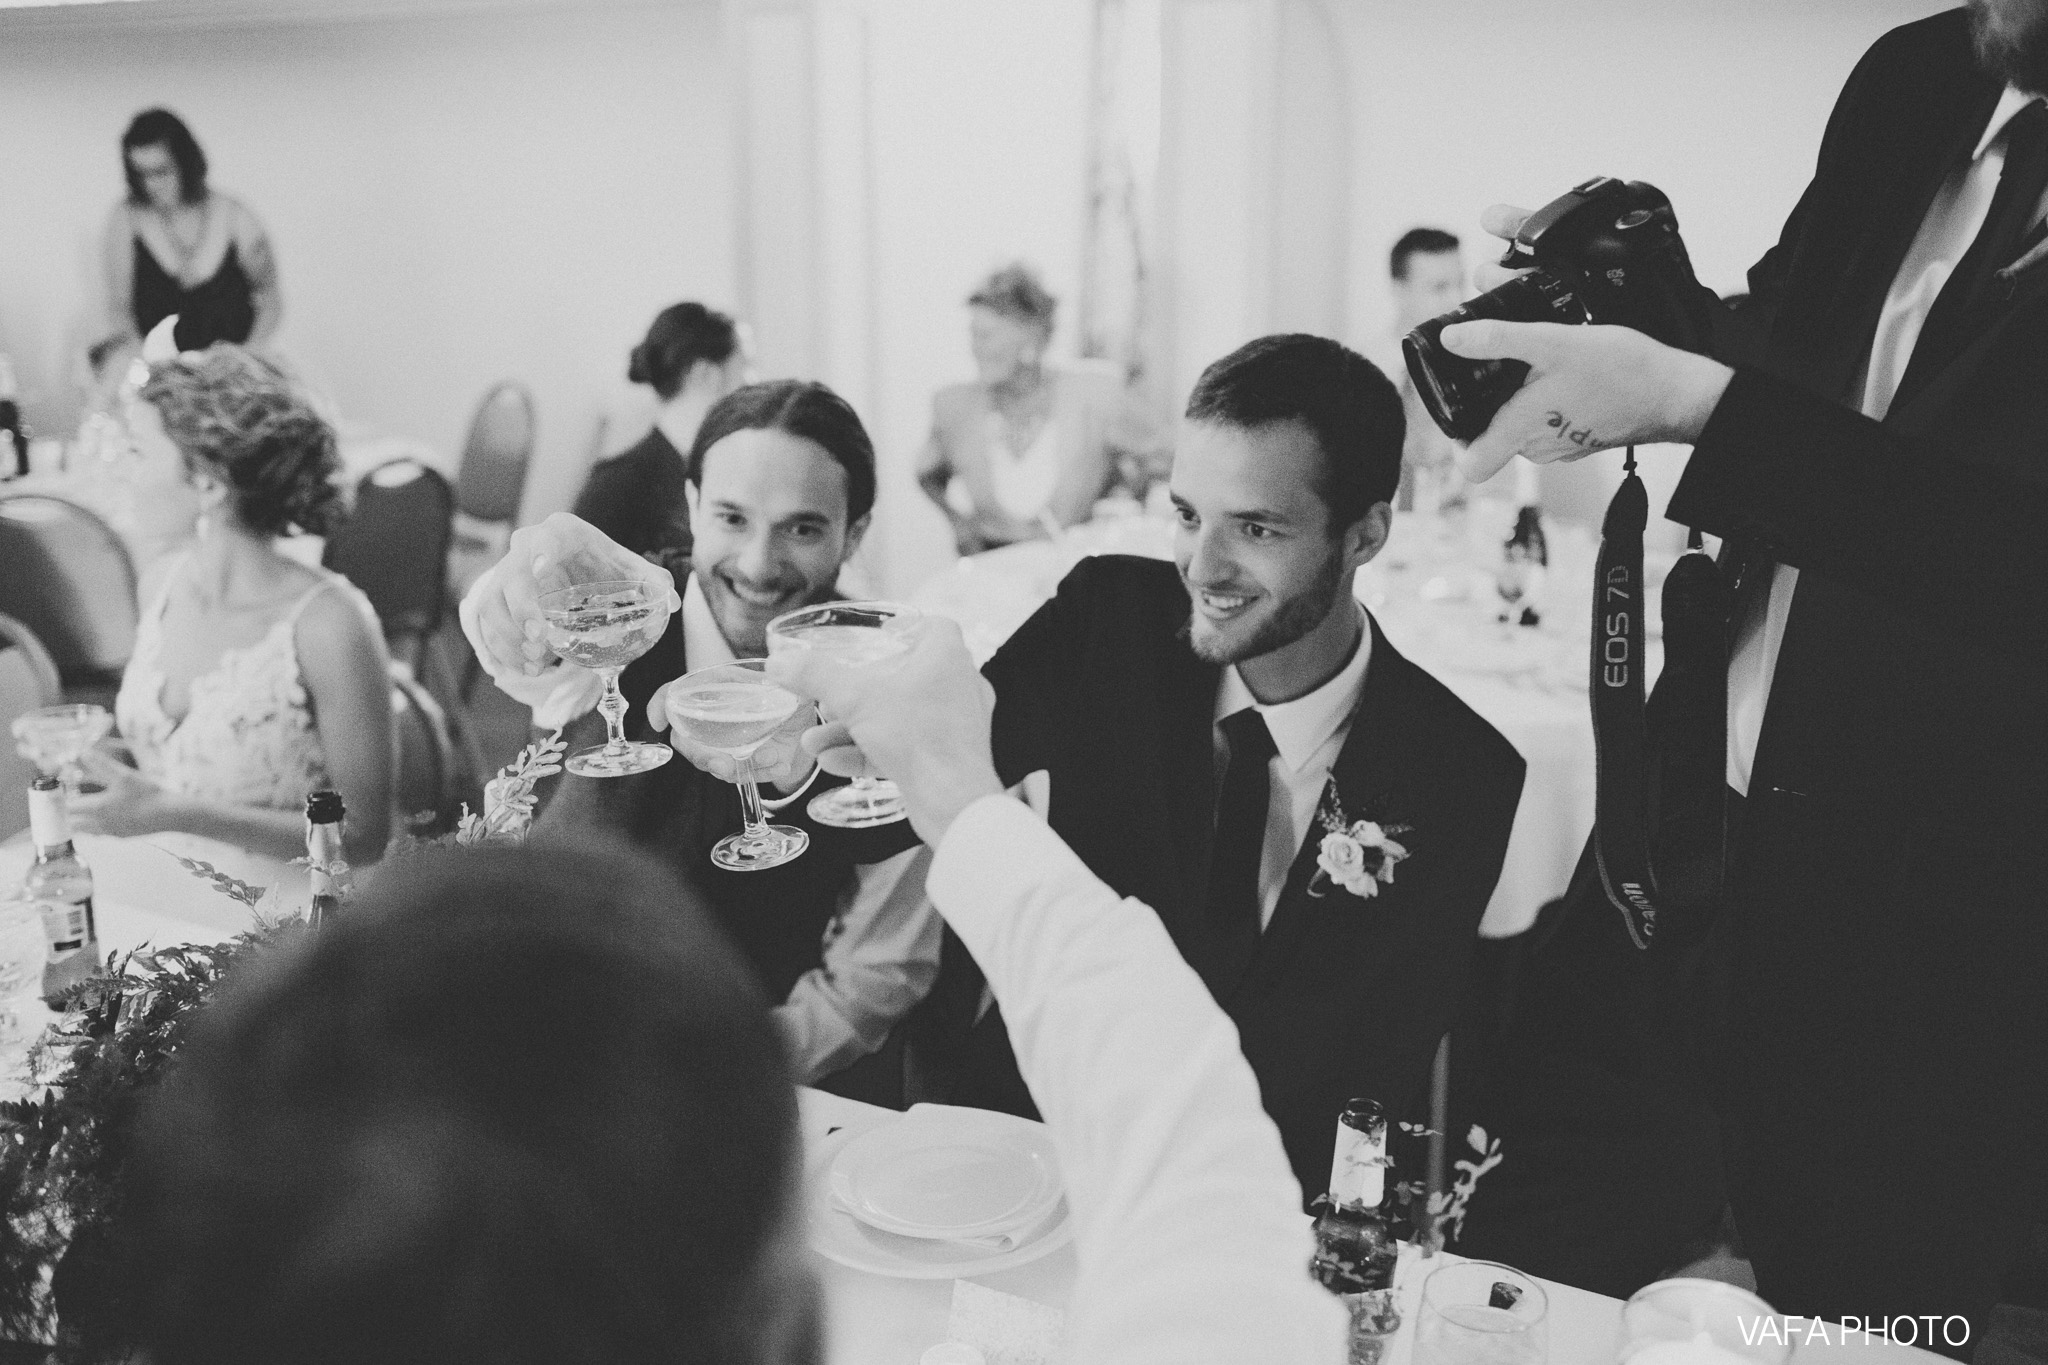 The-Felt-Estate-Wedding-Kailie-David-Vafa-Photo-938.jpg